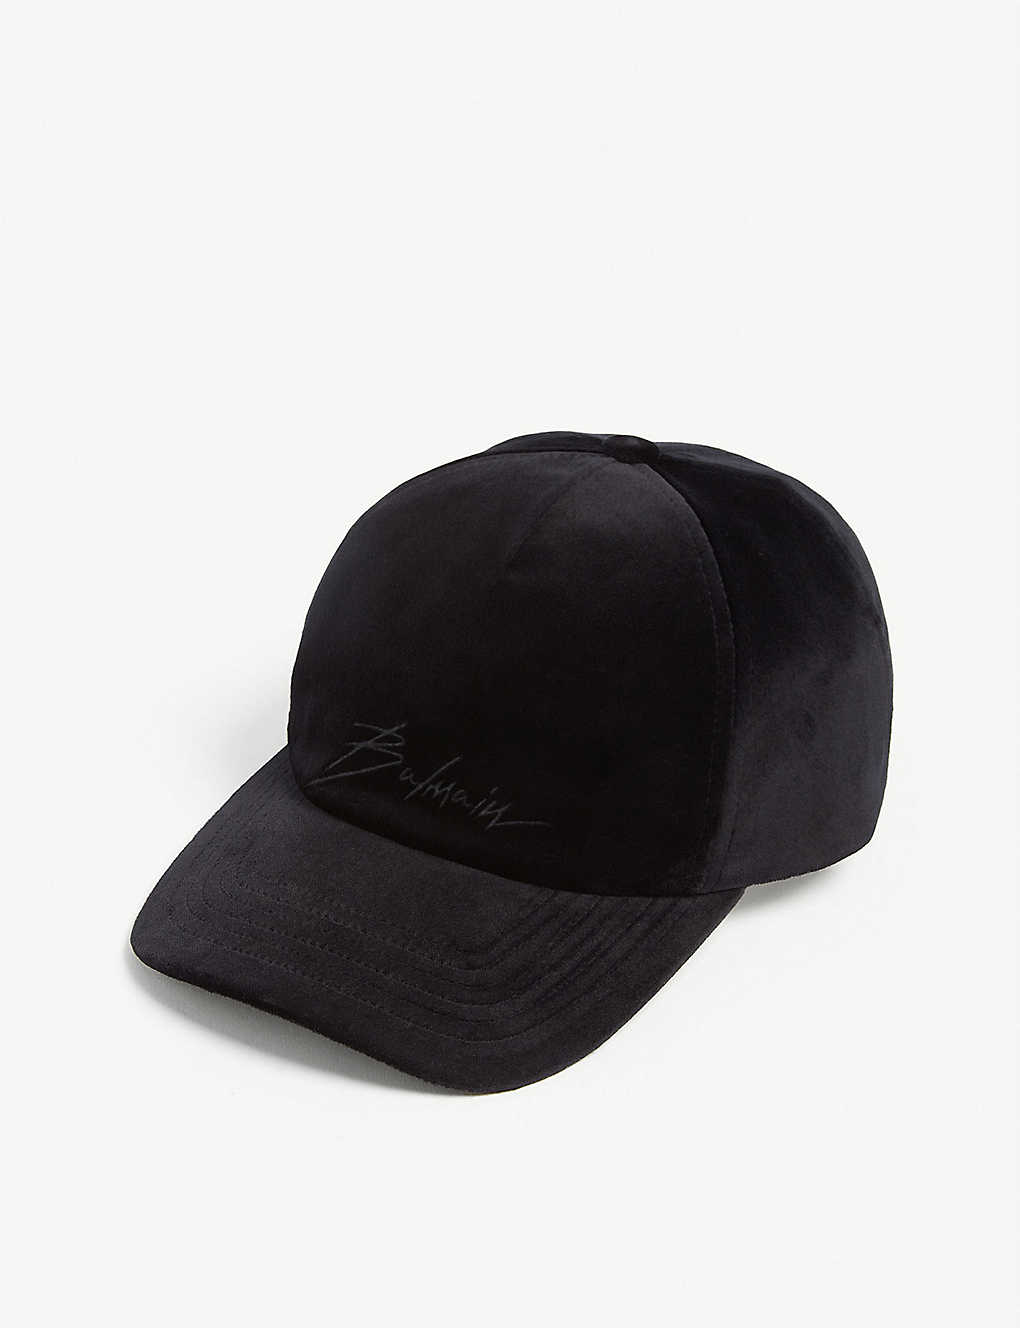 71d1eedbd67 BALMAIN - Logo cotton velour baseball cap   Selfridges.com